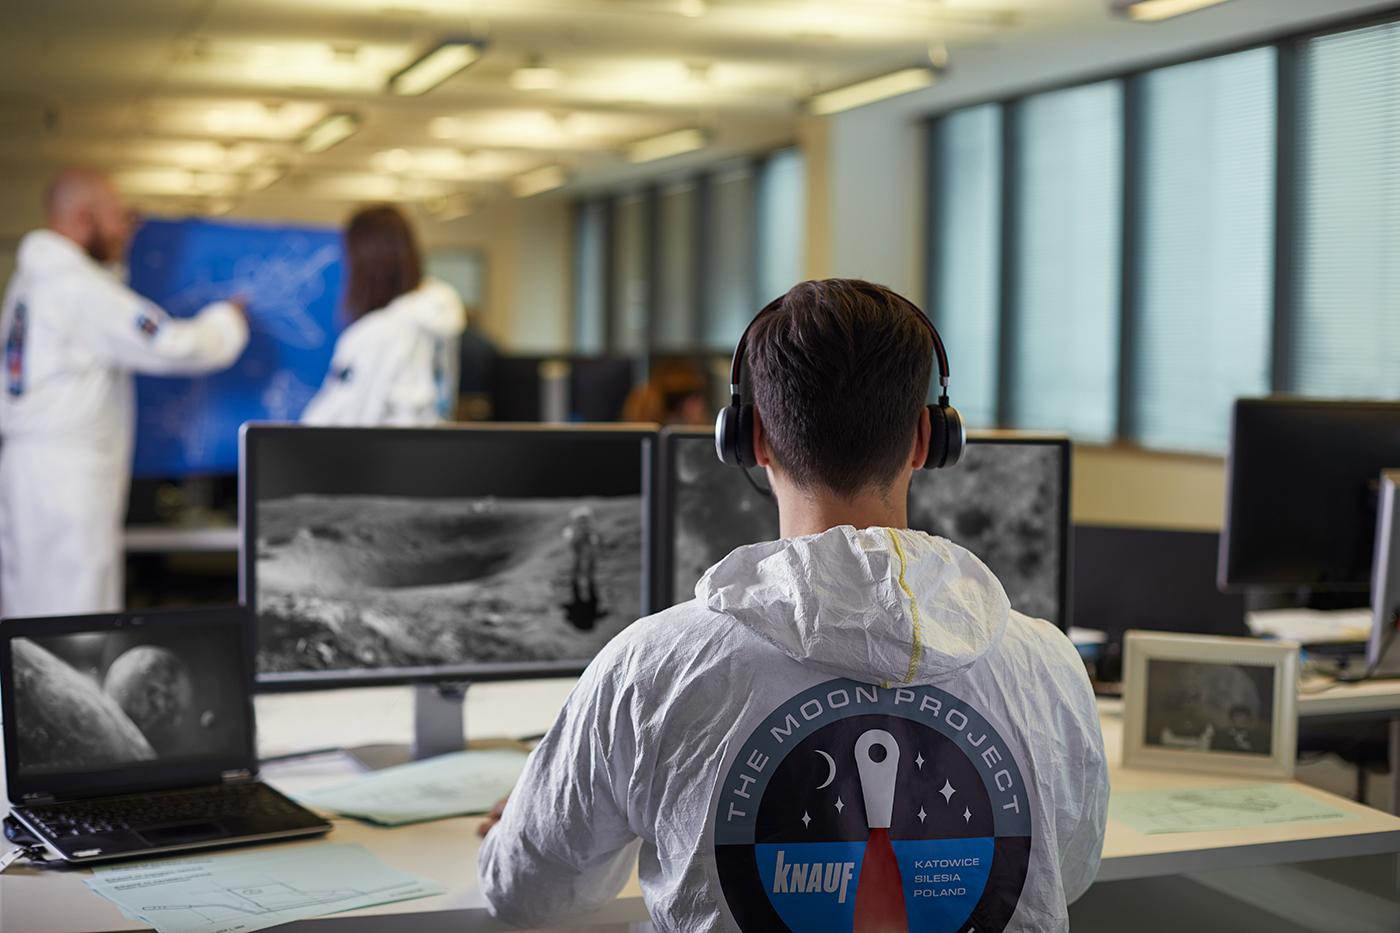 employer branding  campaign knauf IT Website moon Blueprint astronaut patent